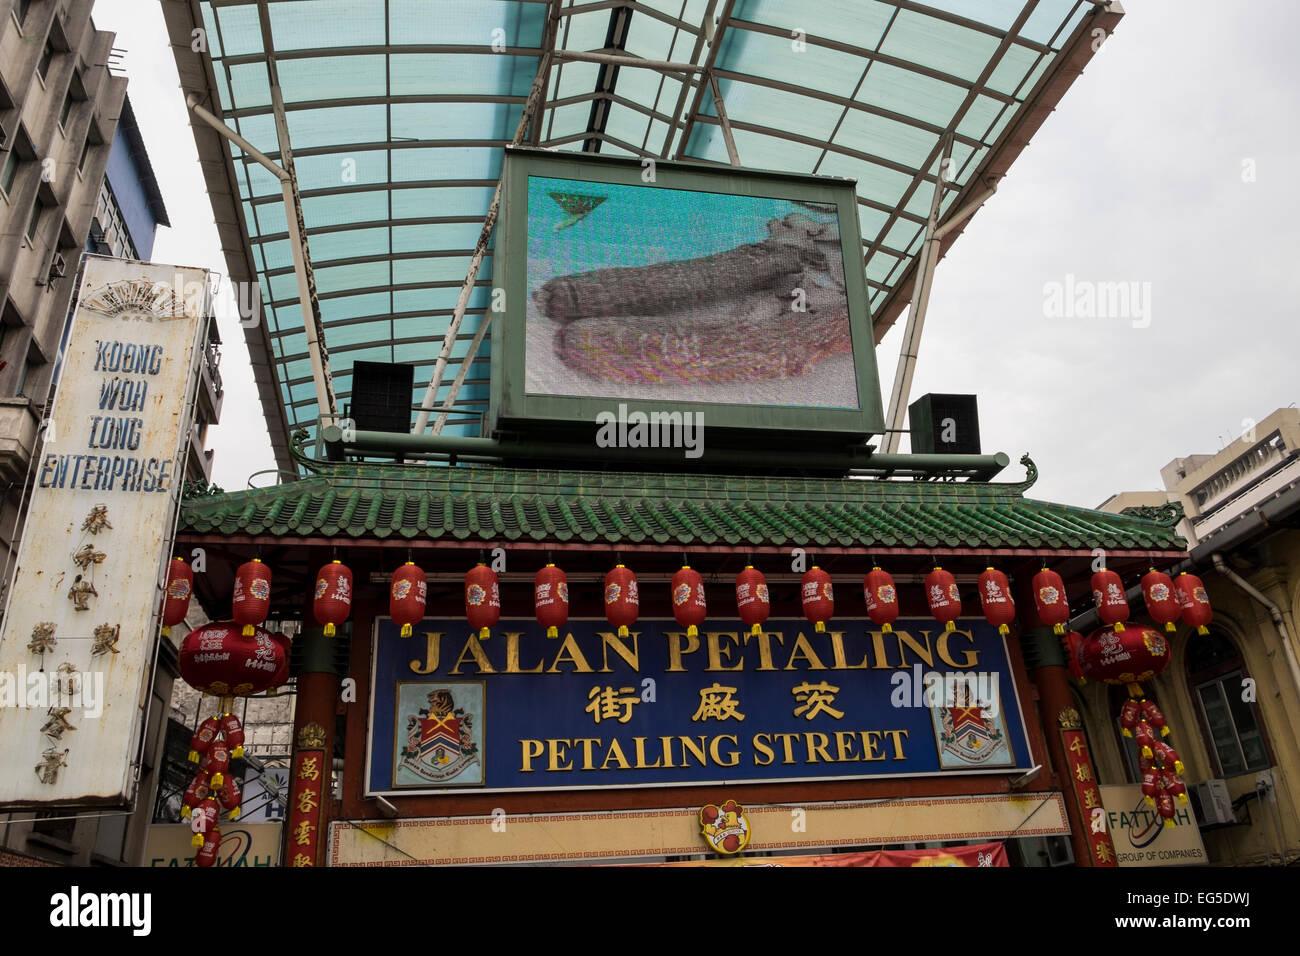 Jalan Petaling gateway to Chinatown in Kuala Lumpur, Malaysia. - Stock Image